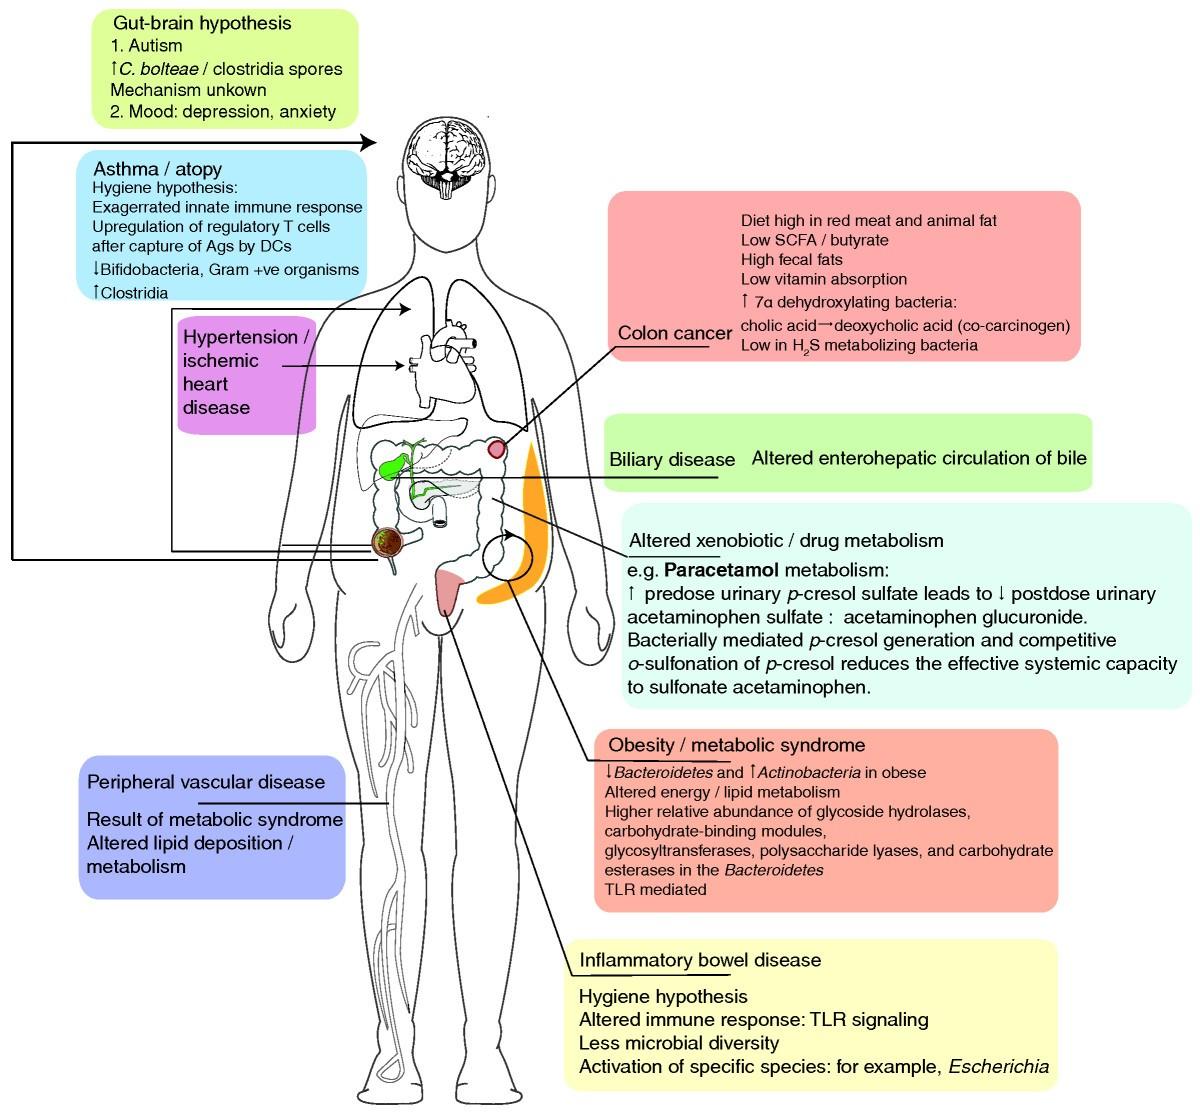 ebook Komplementäre Methodenlehre der klinischen Forschung: Cognition based